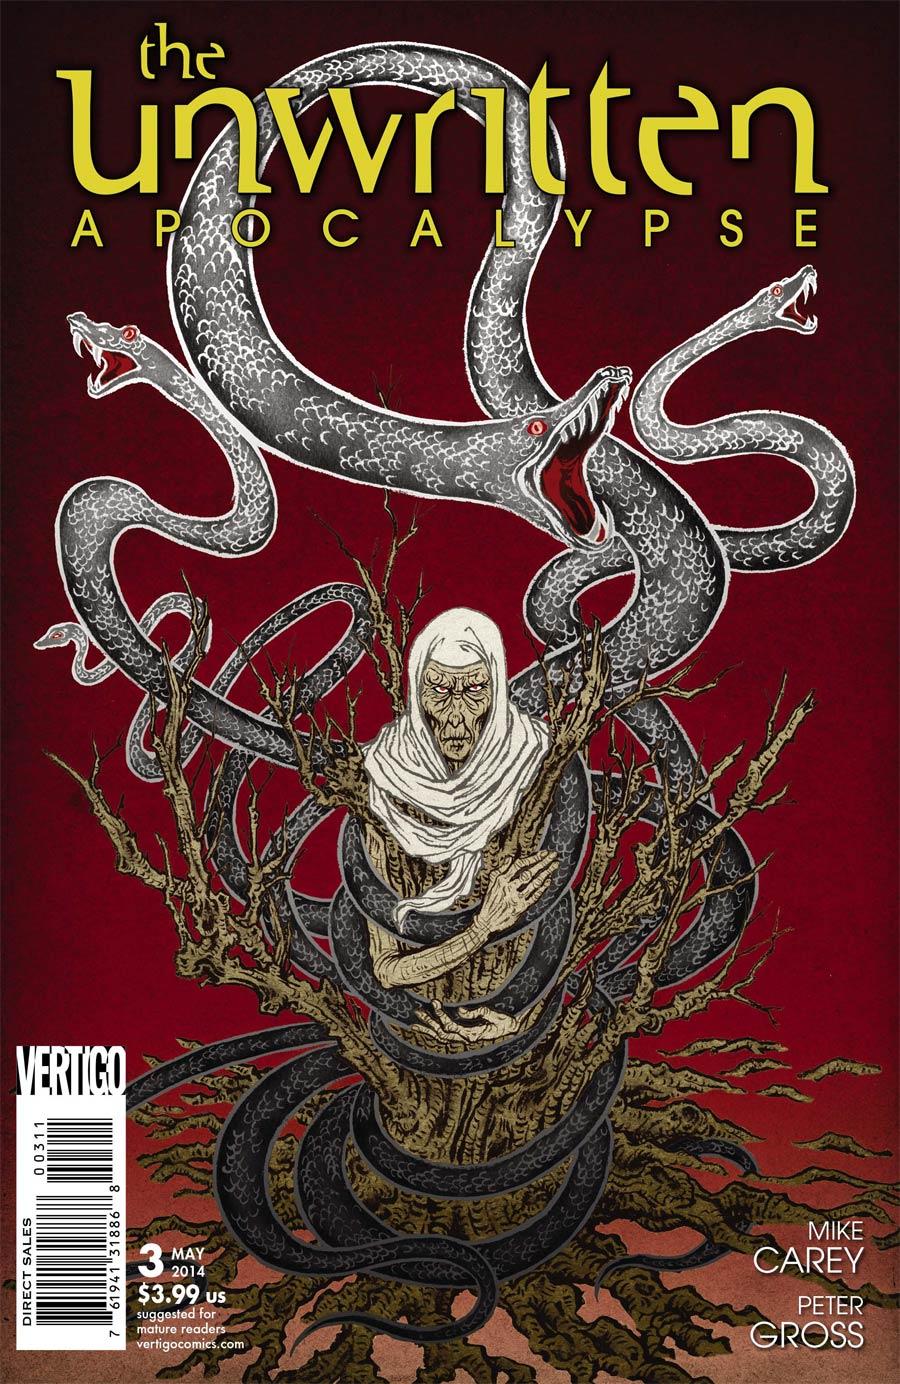 Unwritten Vol 2 Apocalypse #3